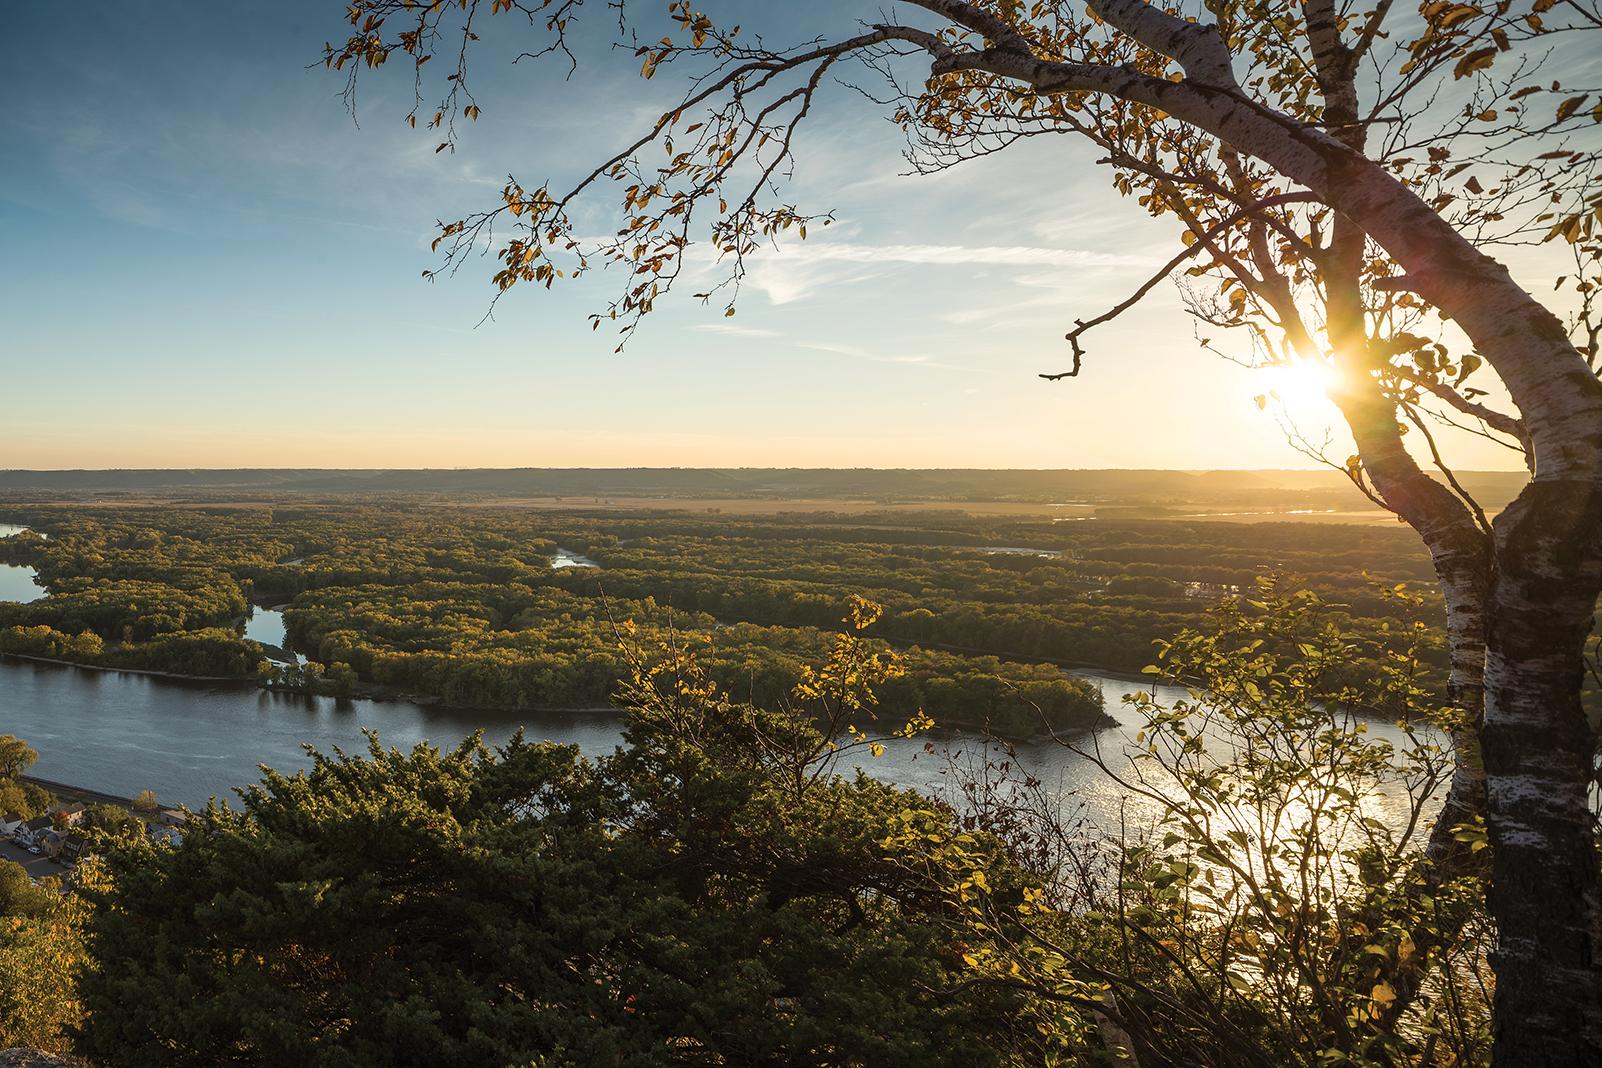 Buena Vista Park overlooking the Mississippi River